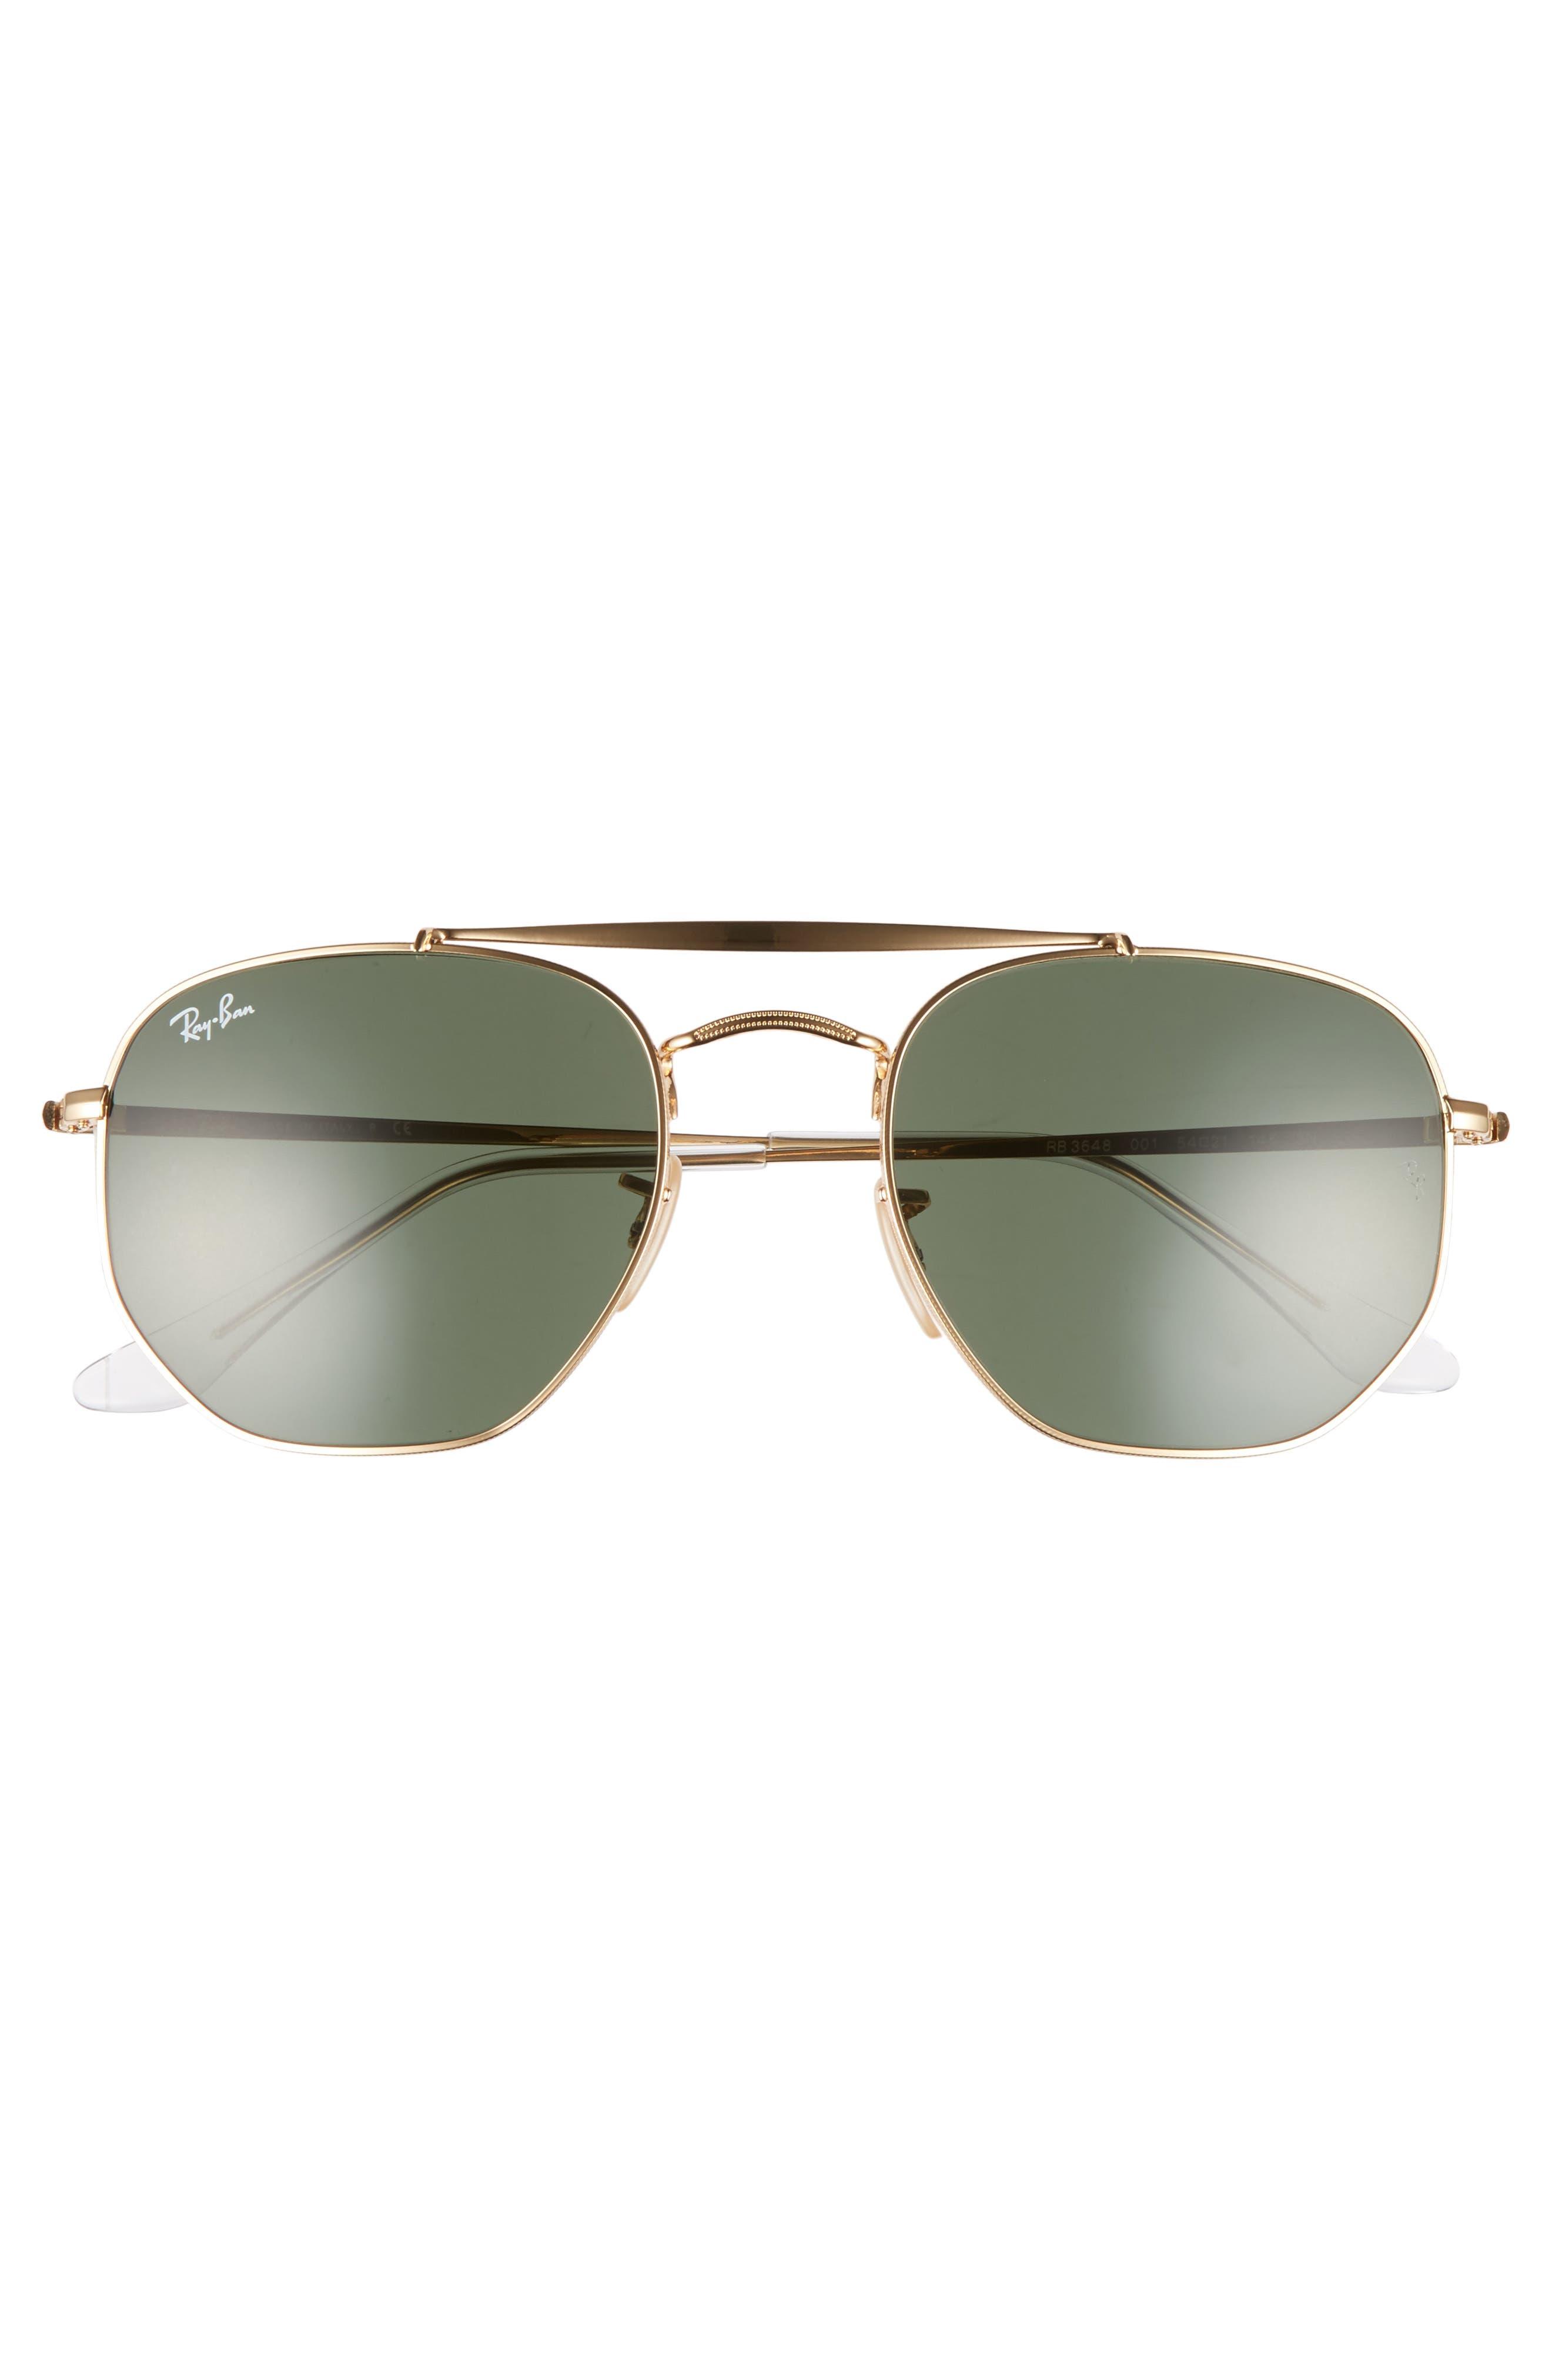 3592 54mm Sunglasses,                             Alternate thumbnail 4, color,                             710